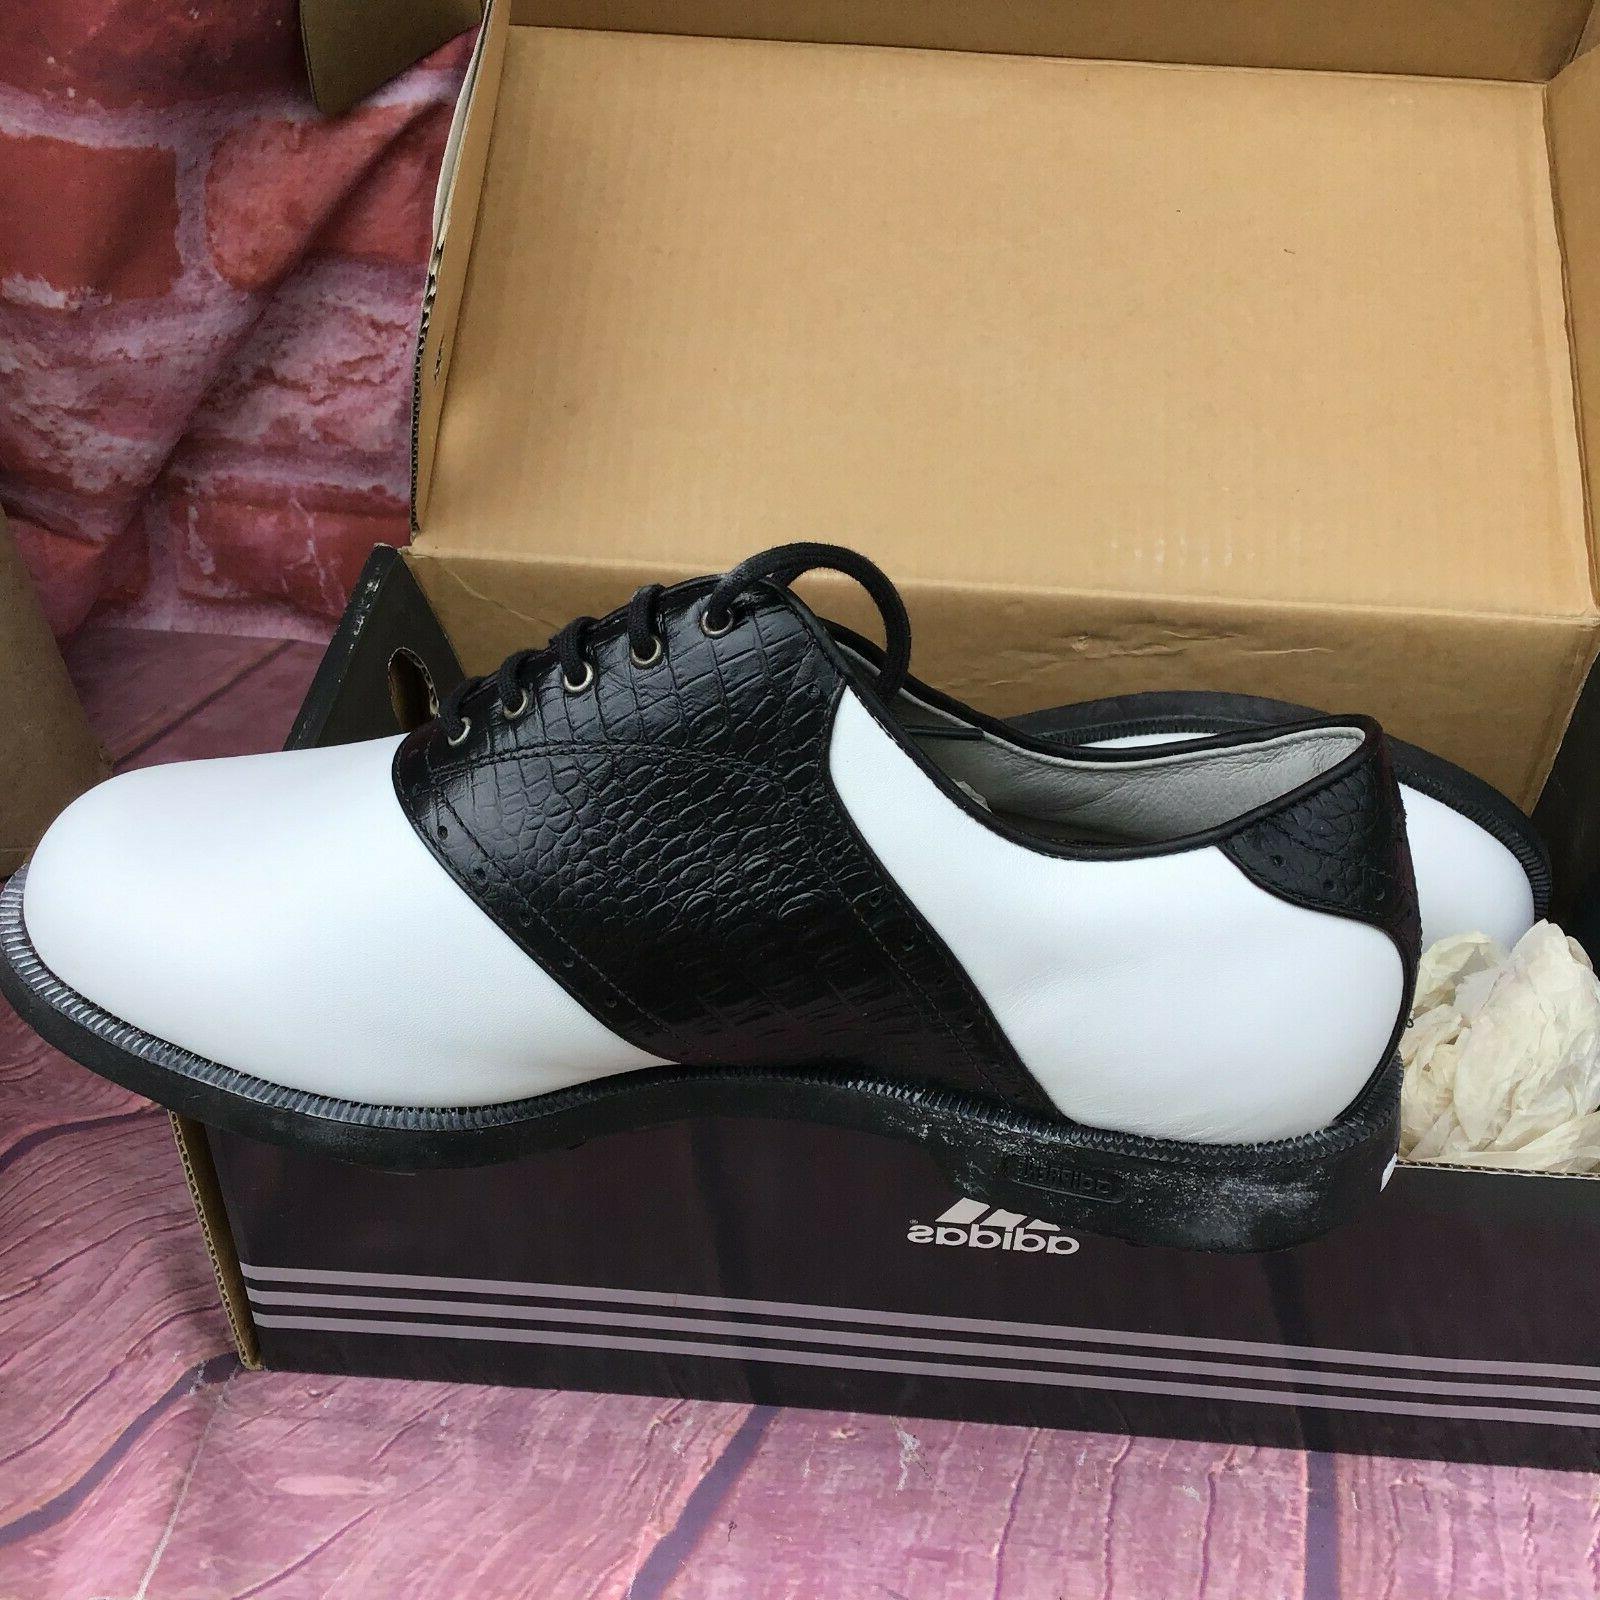 NWB Adidas Men's Sz 8 Black/White Golf Shoes